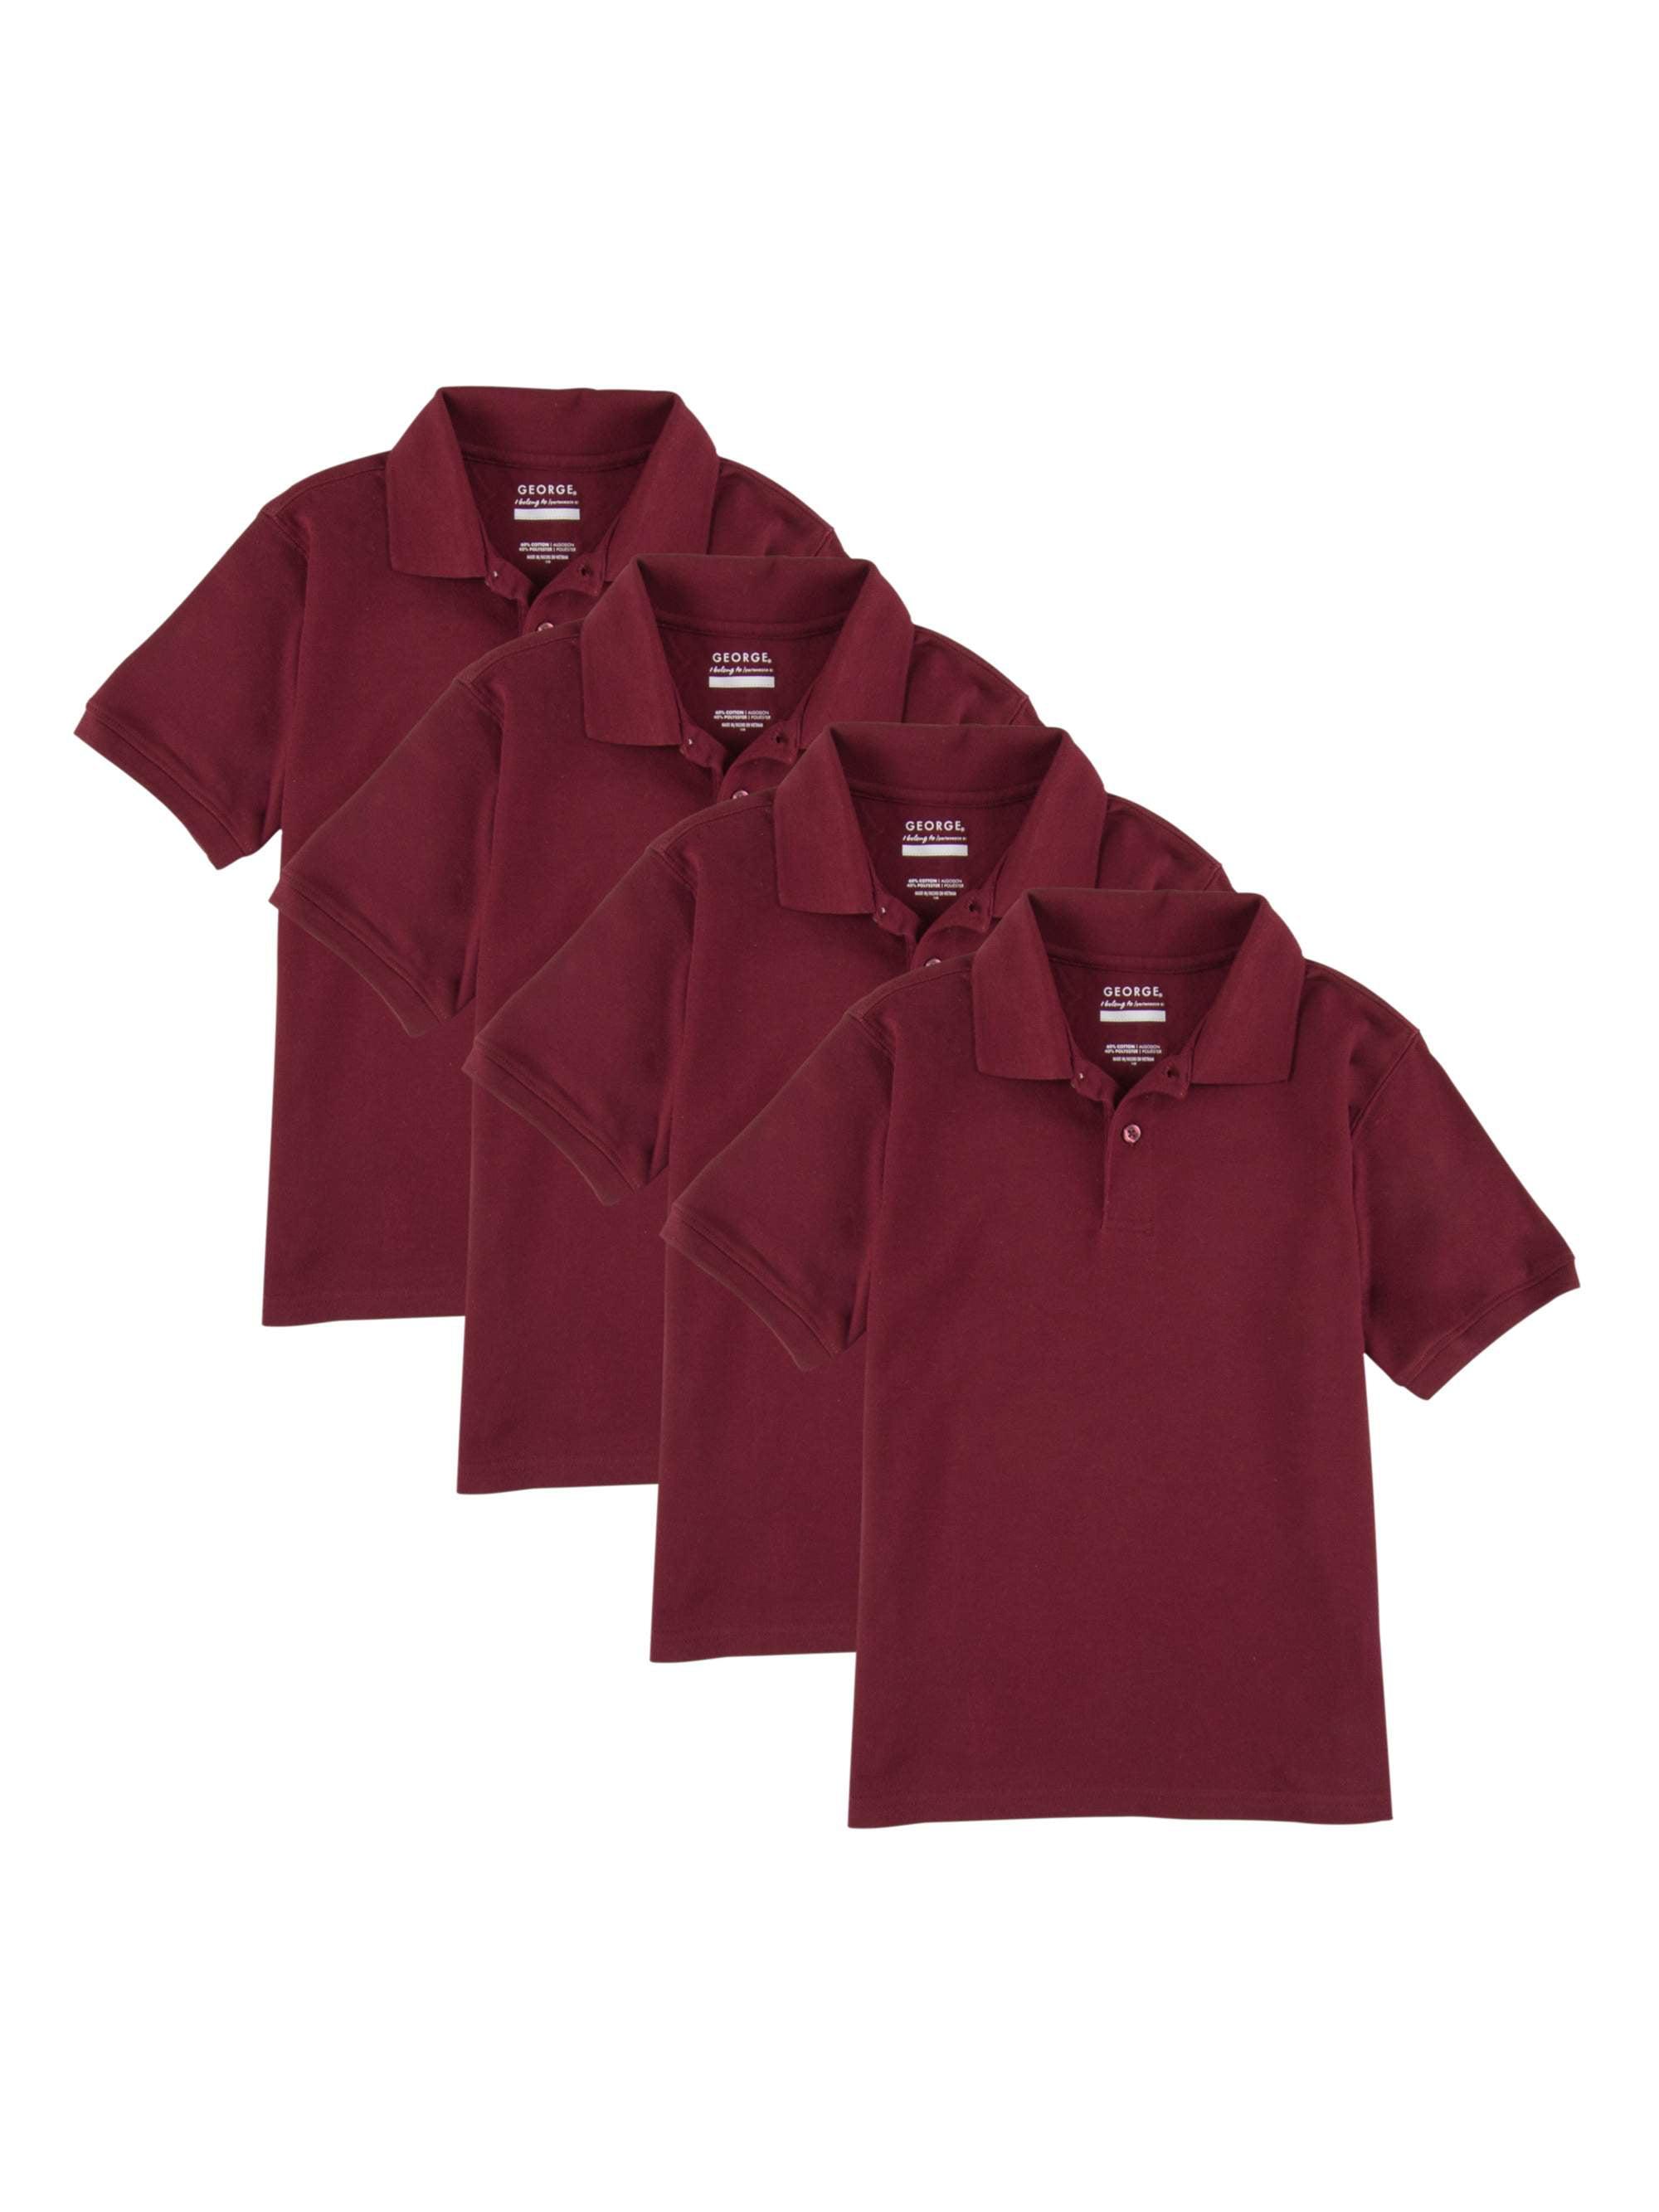 George Boys School Uniforms Short Sleeve Pique Polo Shirts 4 Pack